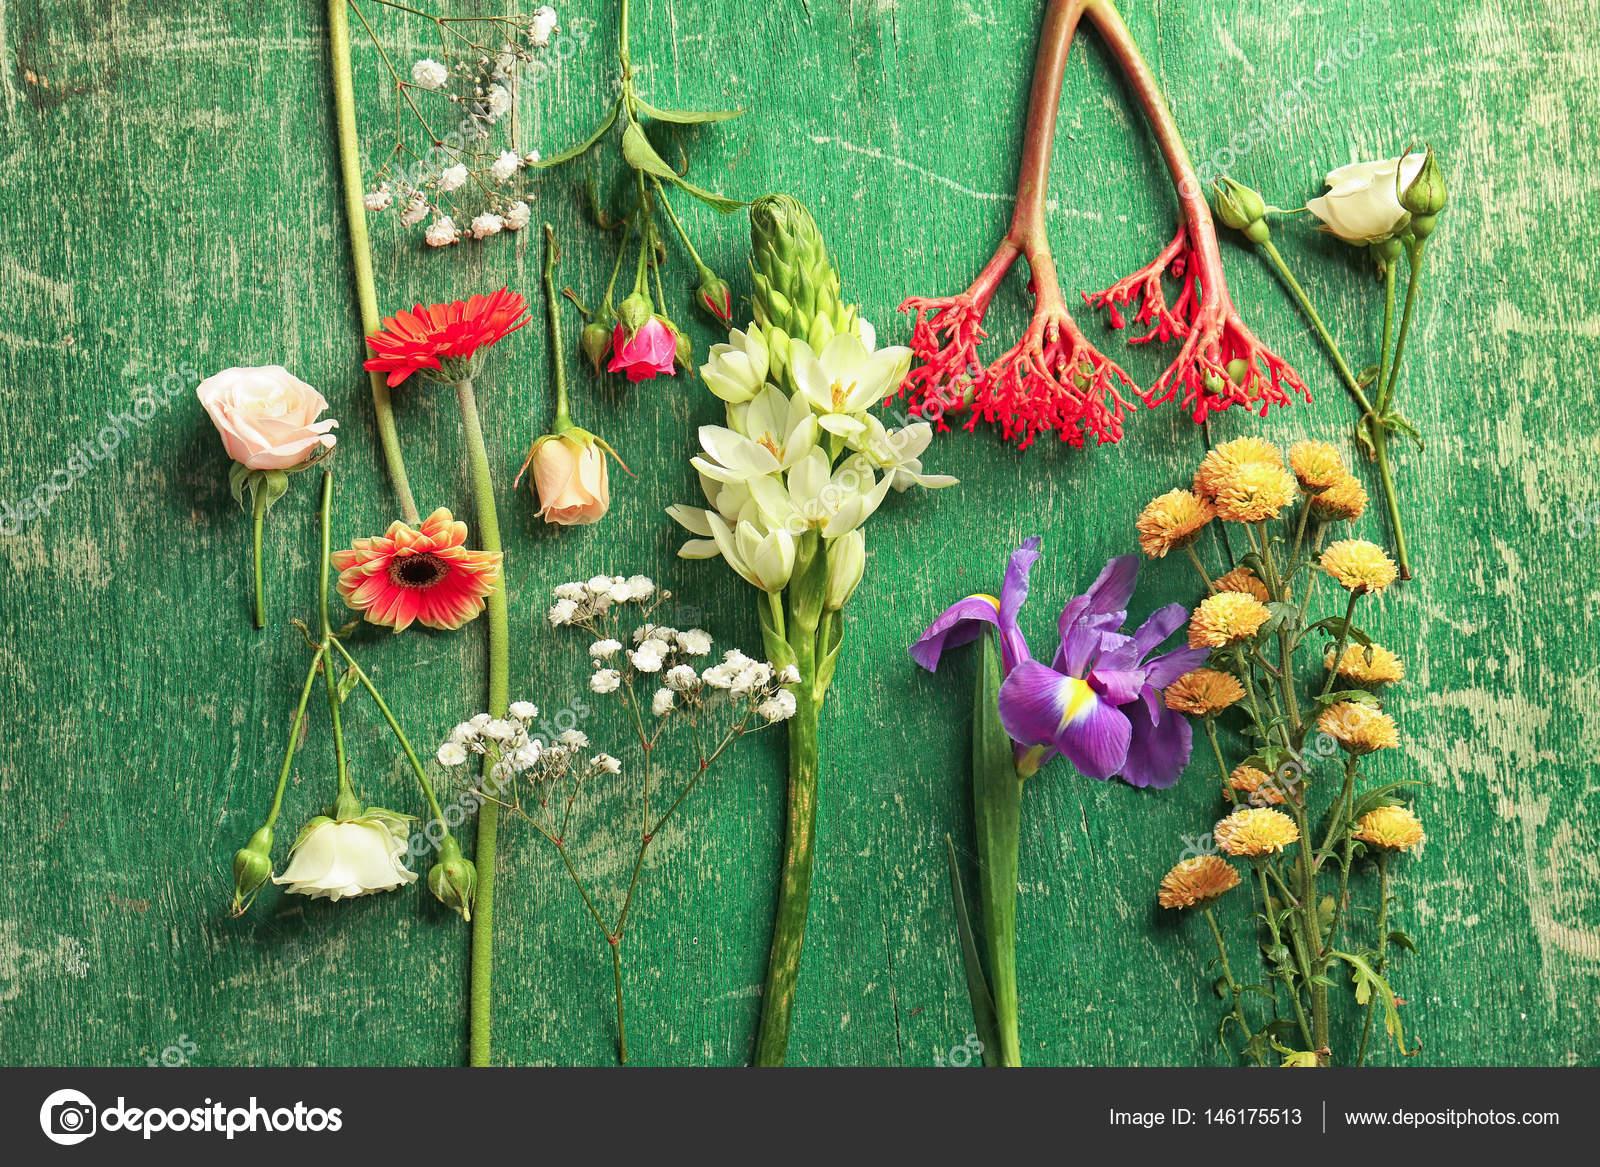 Beautiful fresh flowers stock photo belchonock 146175513 beautiful fresh flowers on green wooden background photo by belchonock izmirmasajfo Gallery